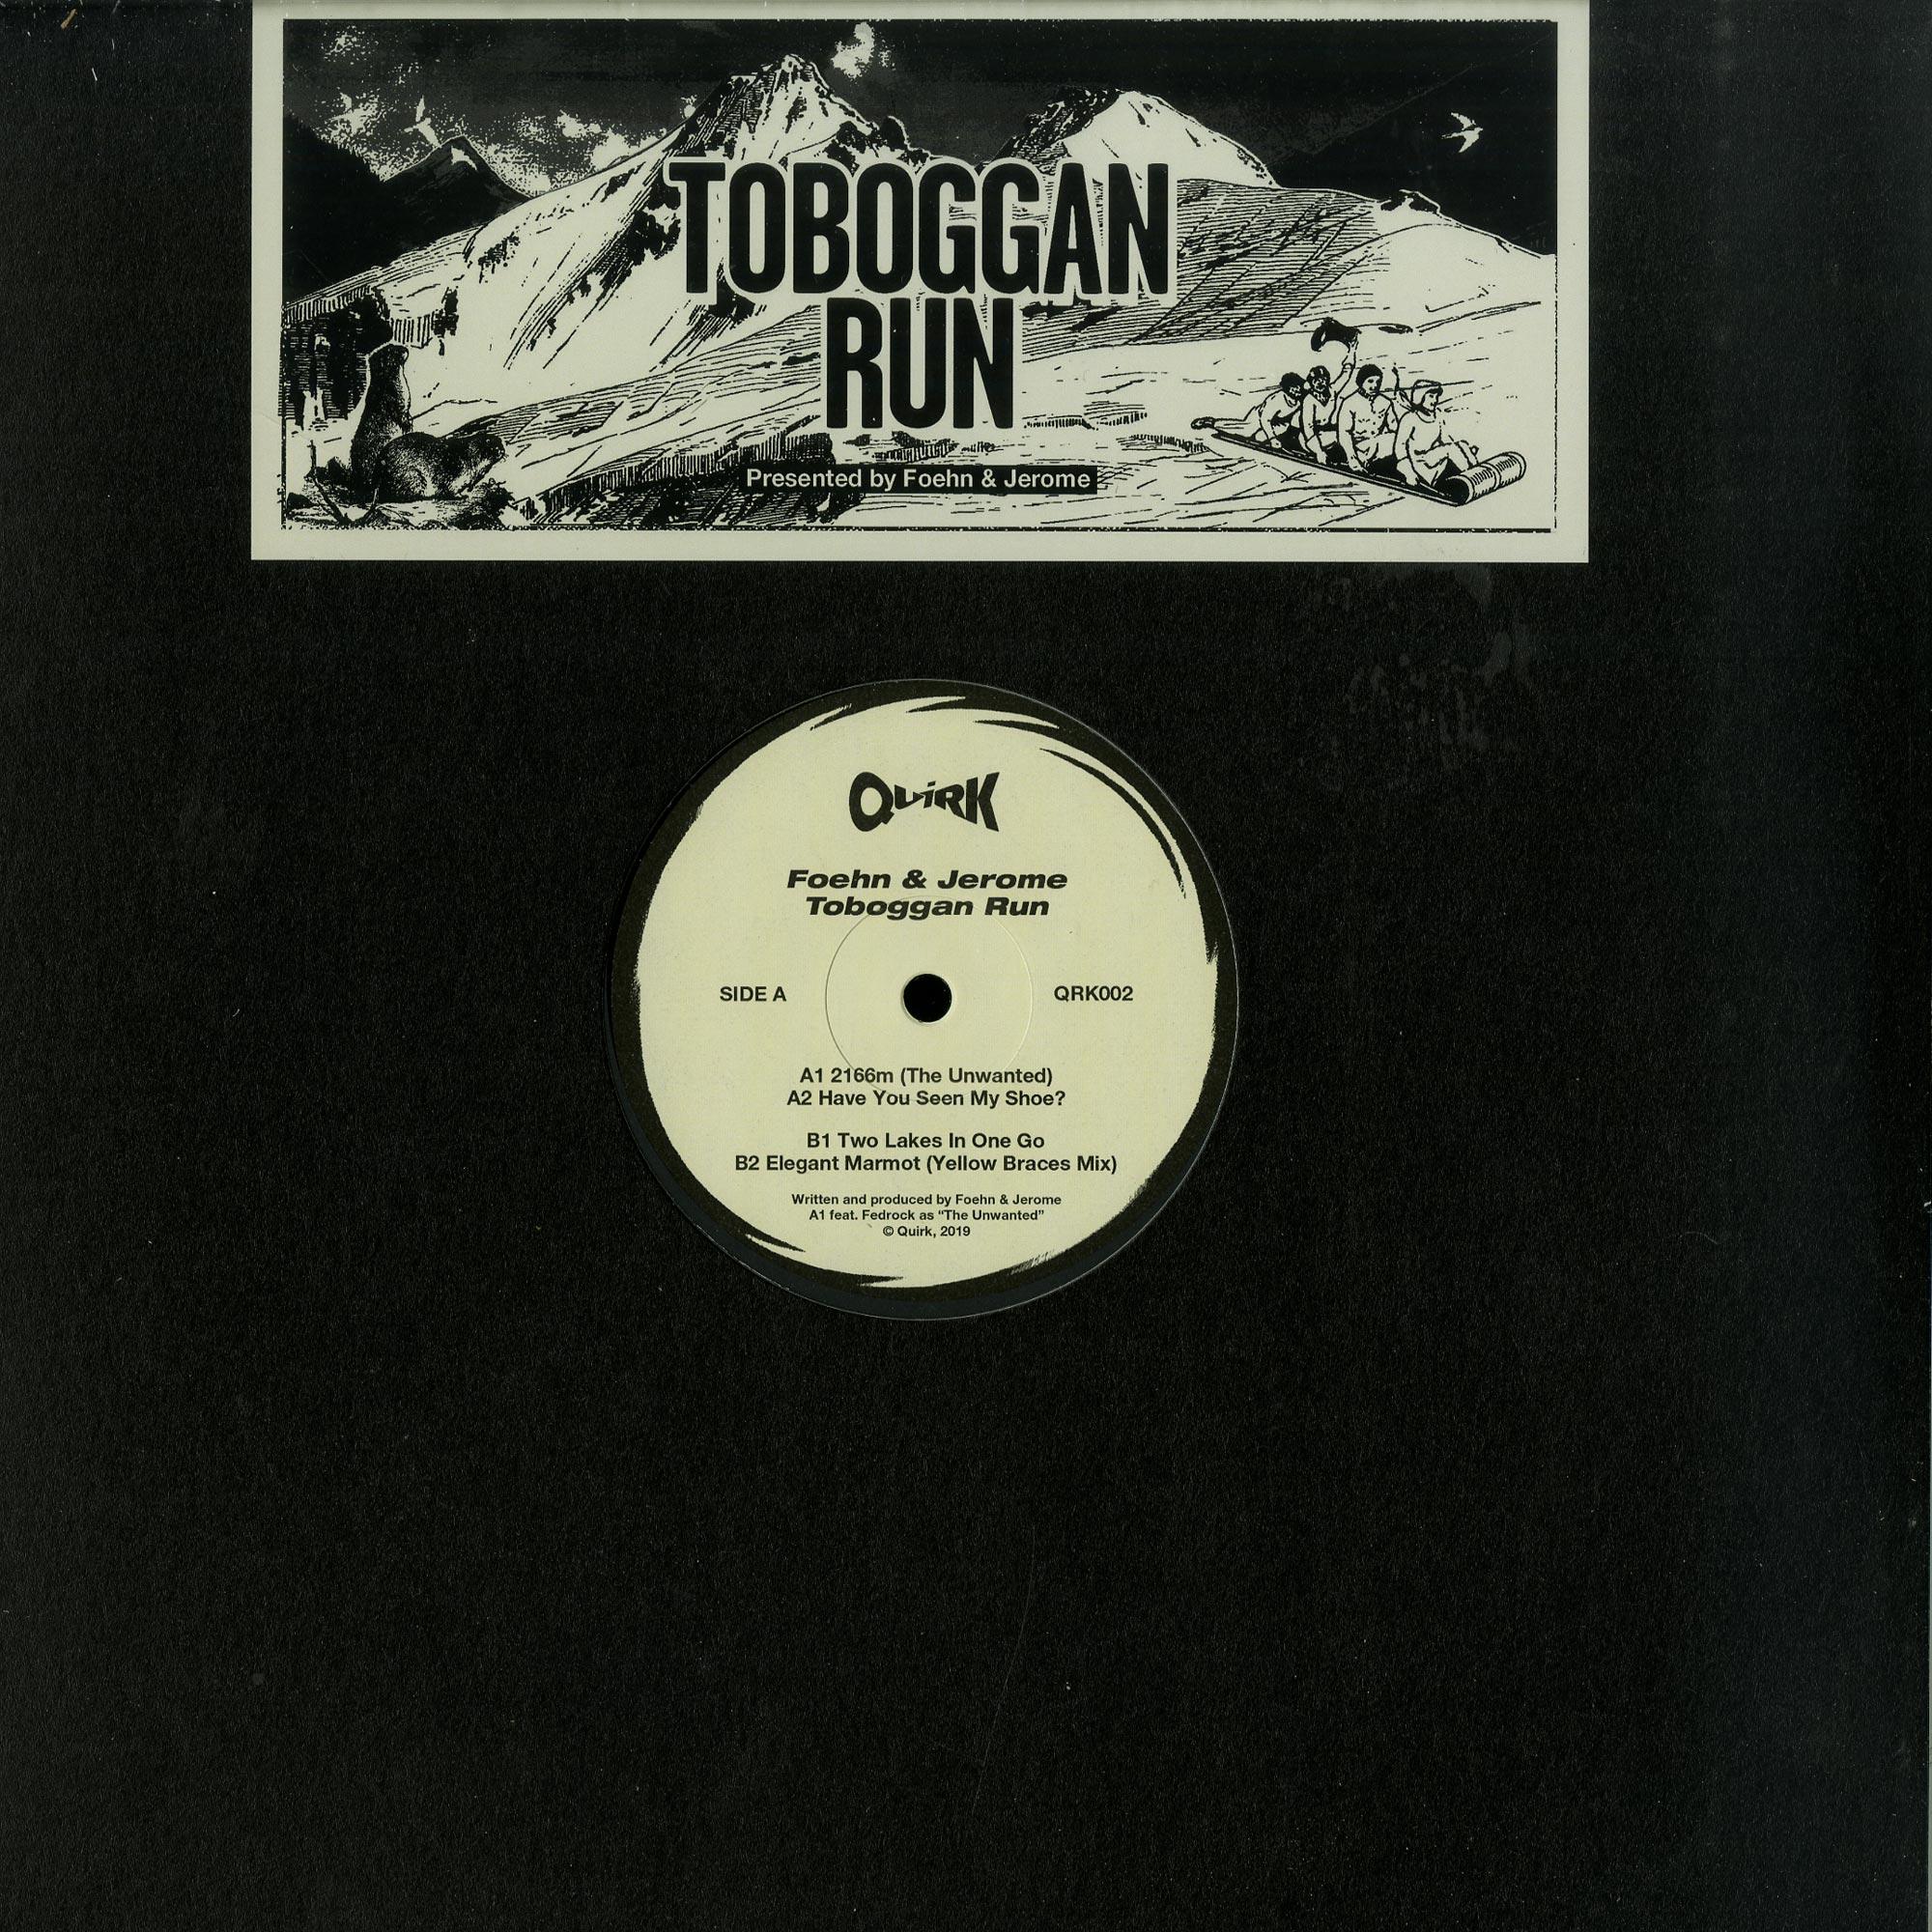 Foehn & Jerome - Toboggan Run